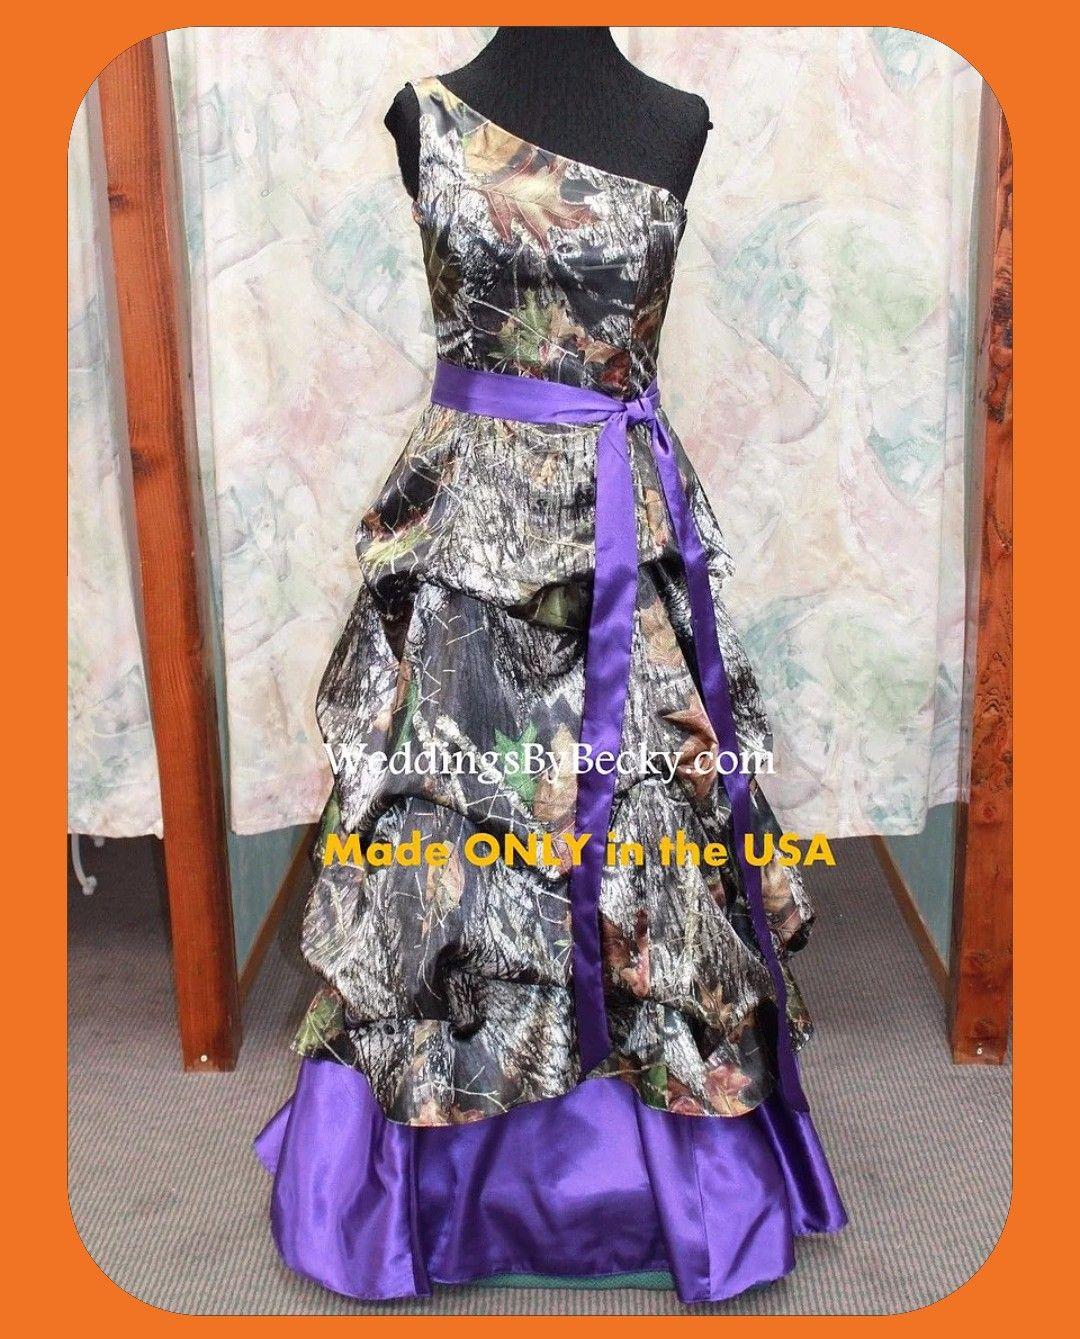 Image found on google search for purple camo wedding dress